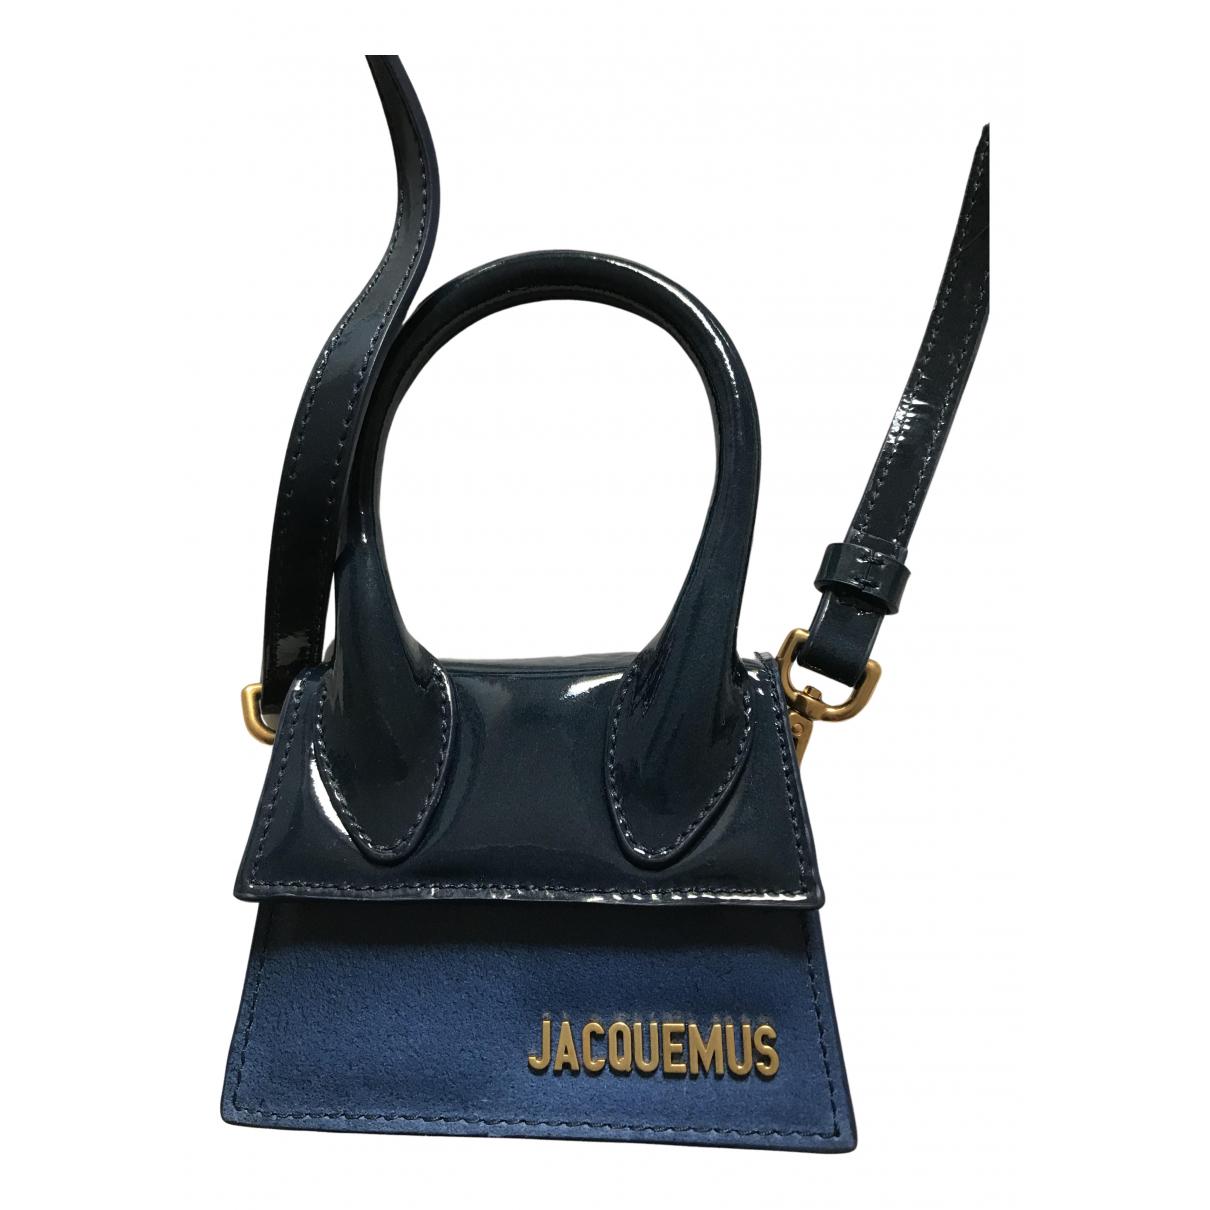 Jacquemus Chiquito Blue Leather handbag for Women N